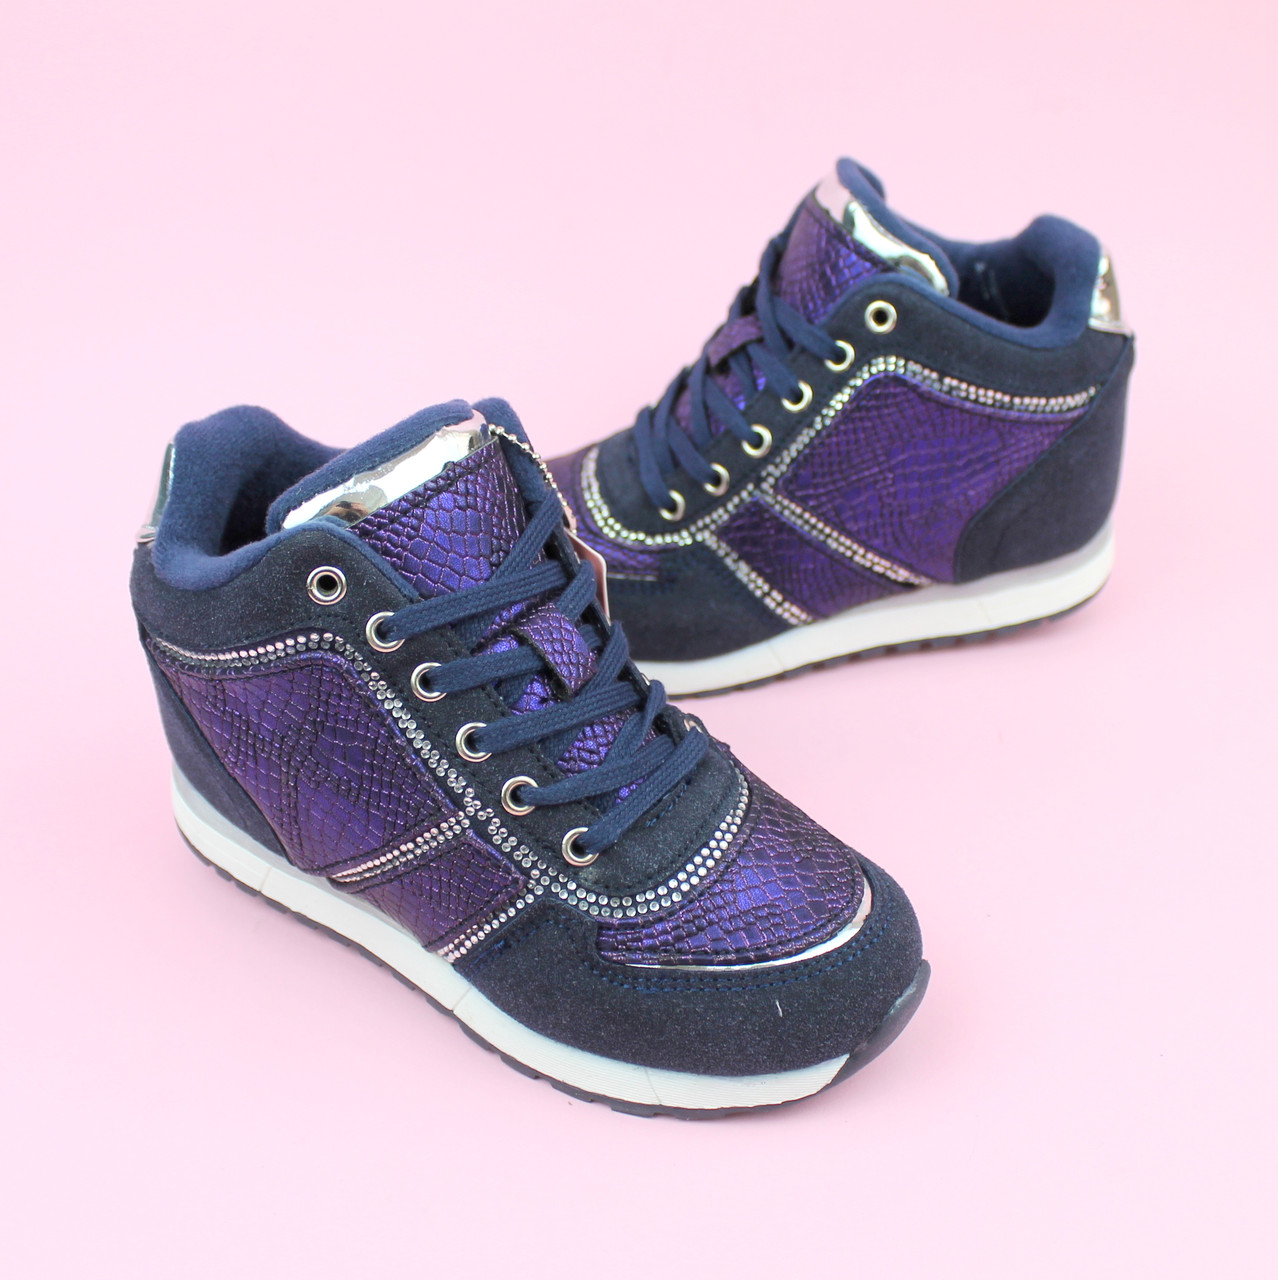 Ботинки демисезонные девочке сникерсы тм Bi&Ki размер 31,35